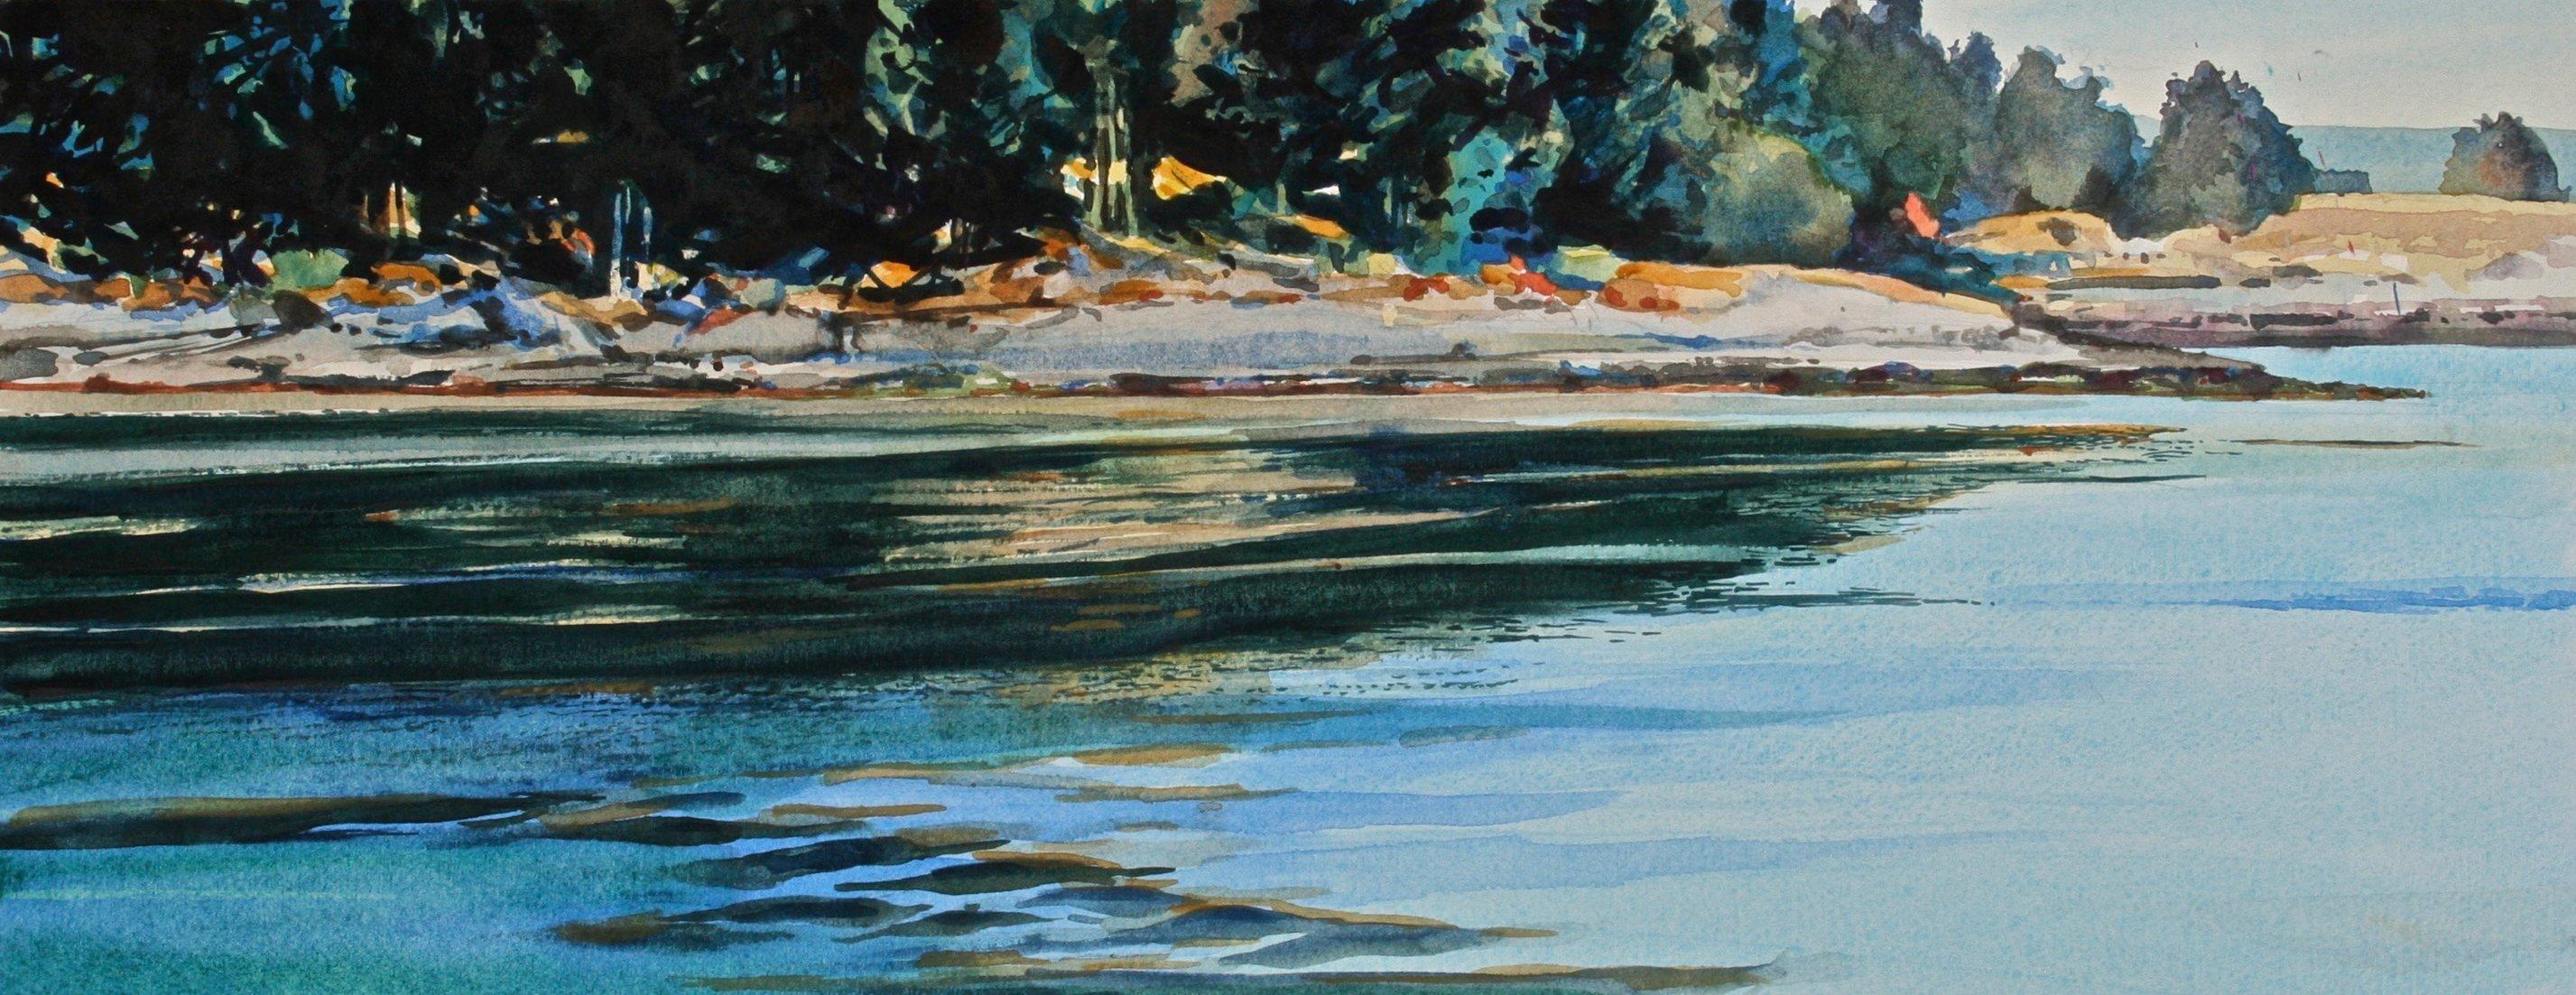 Porlier Pass Cove, Galiano.